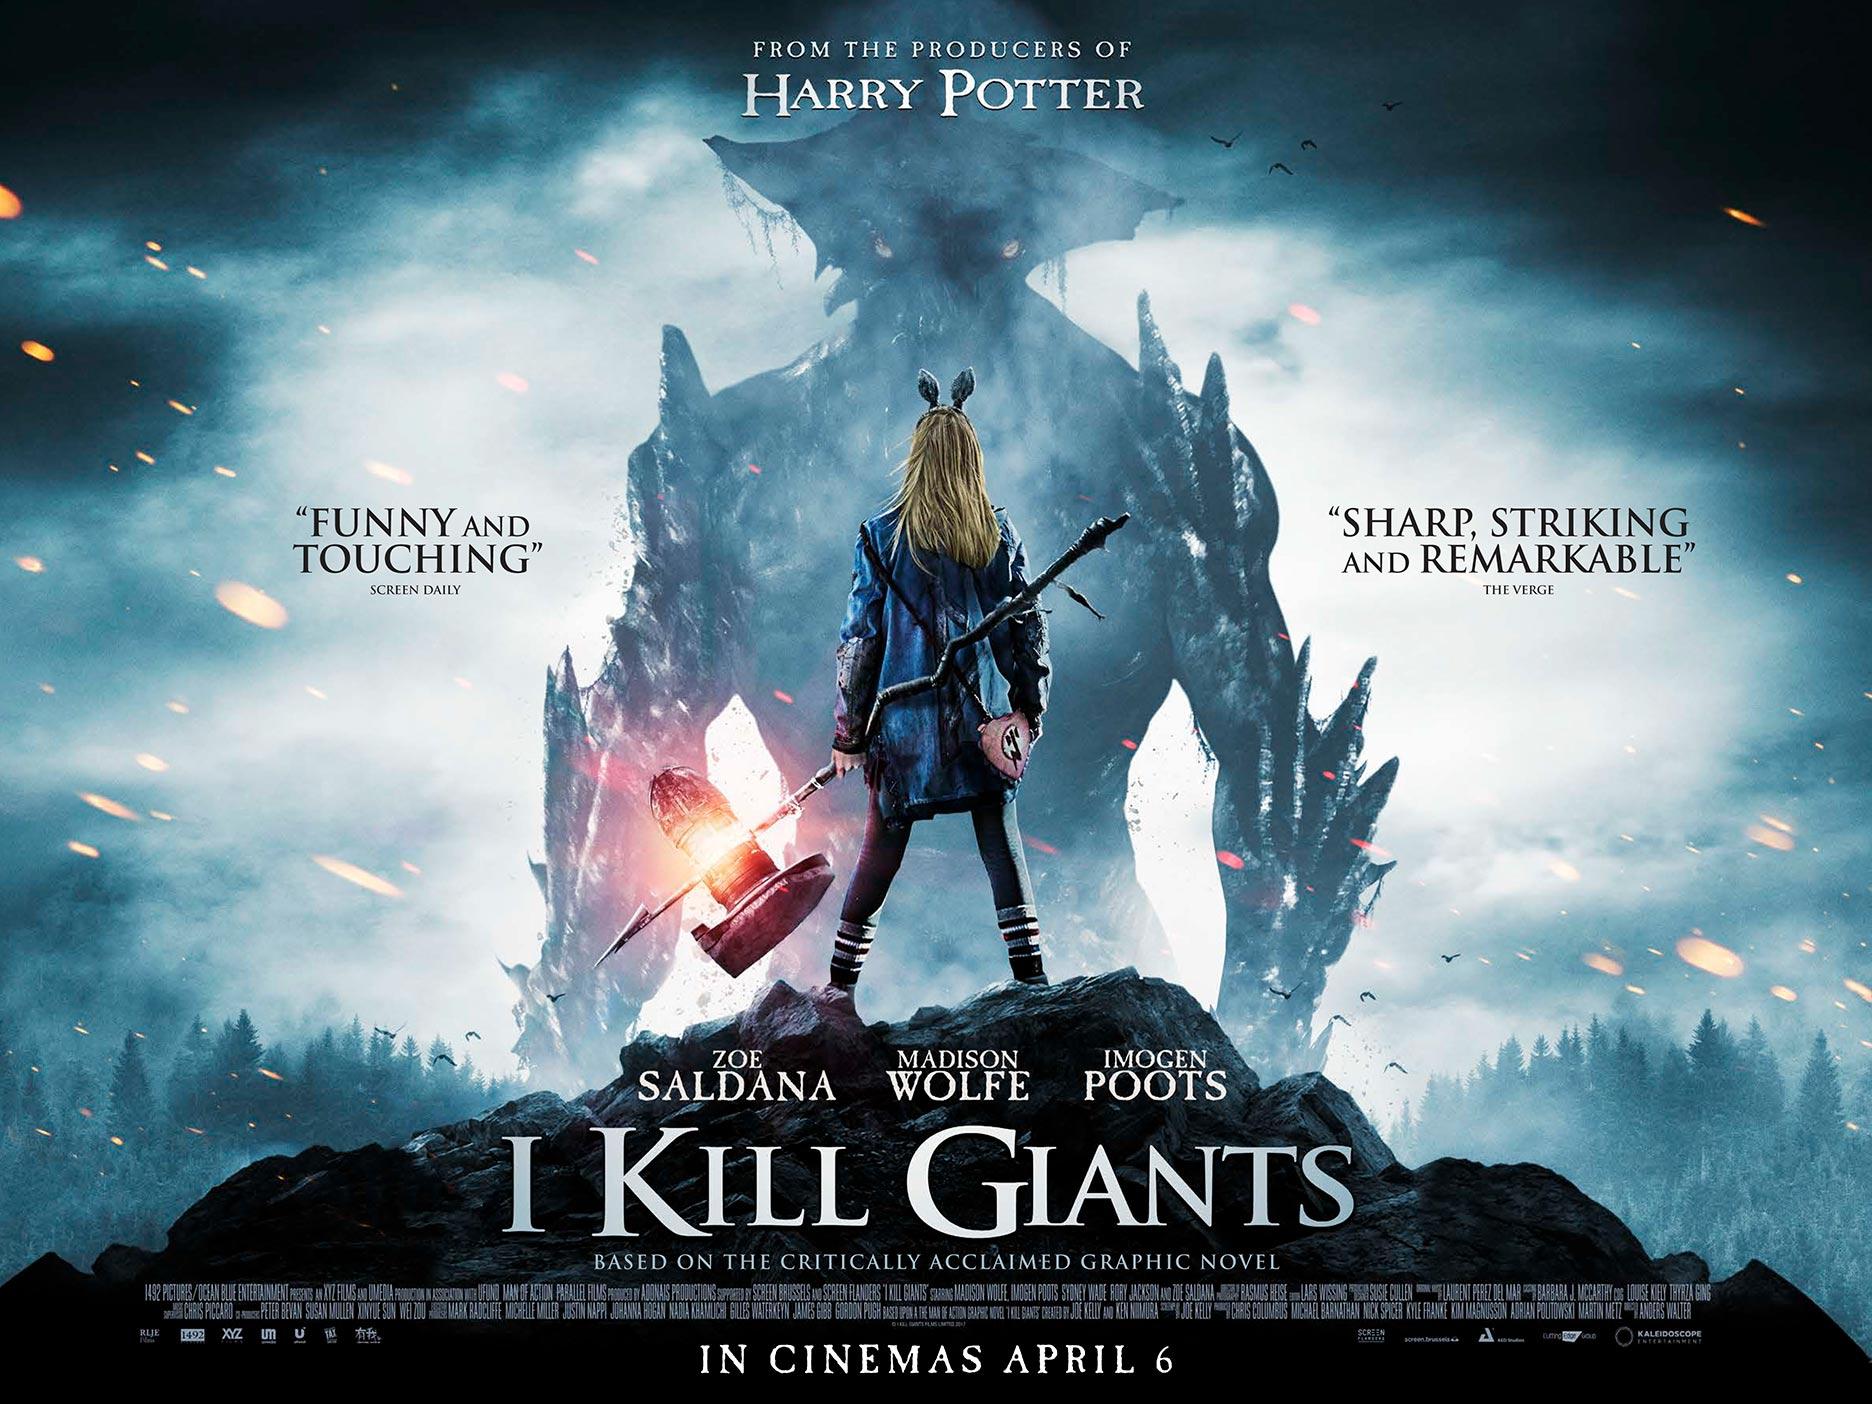 I Kill Giants (2018) Poster #1 - Trailer Addict